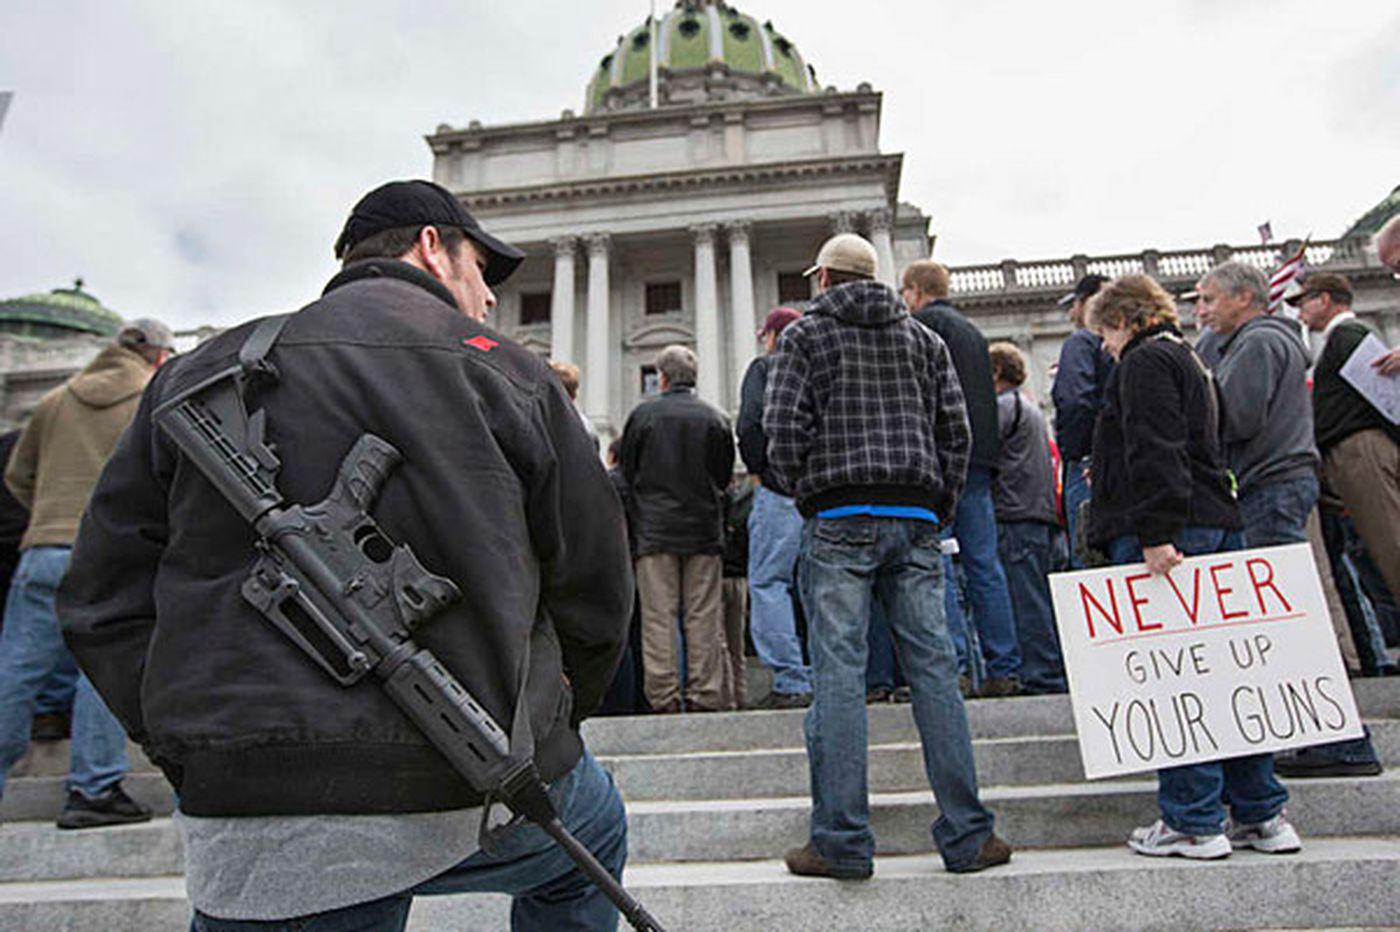 The Pennsylvania gun club holds a meeting